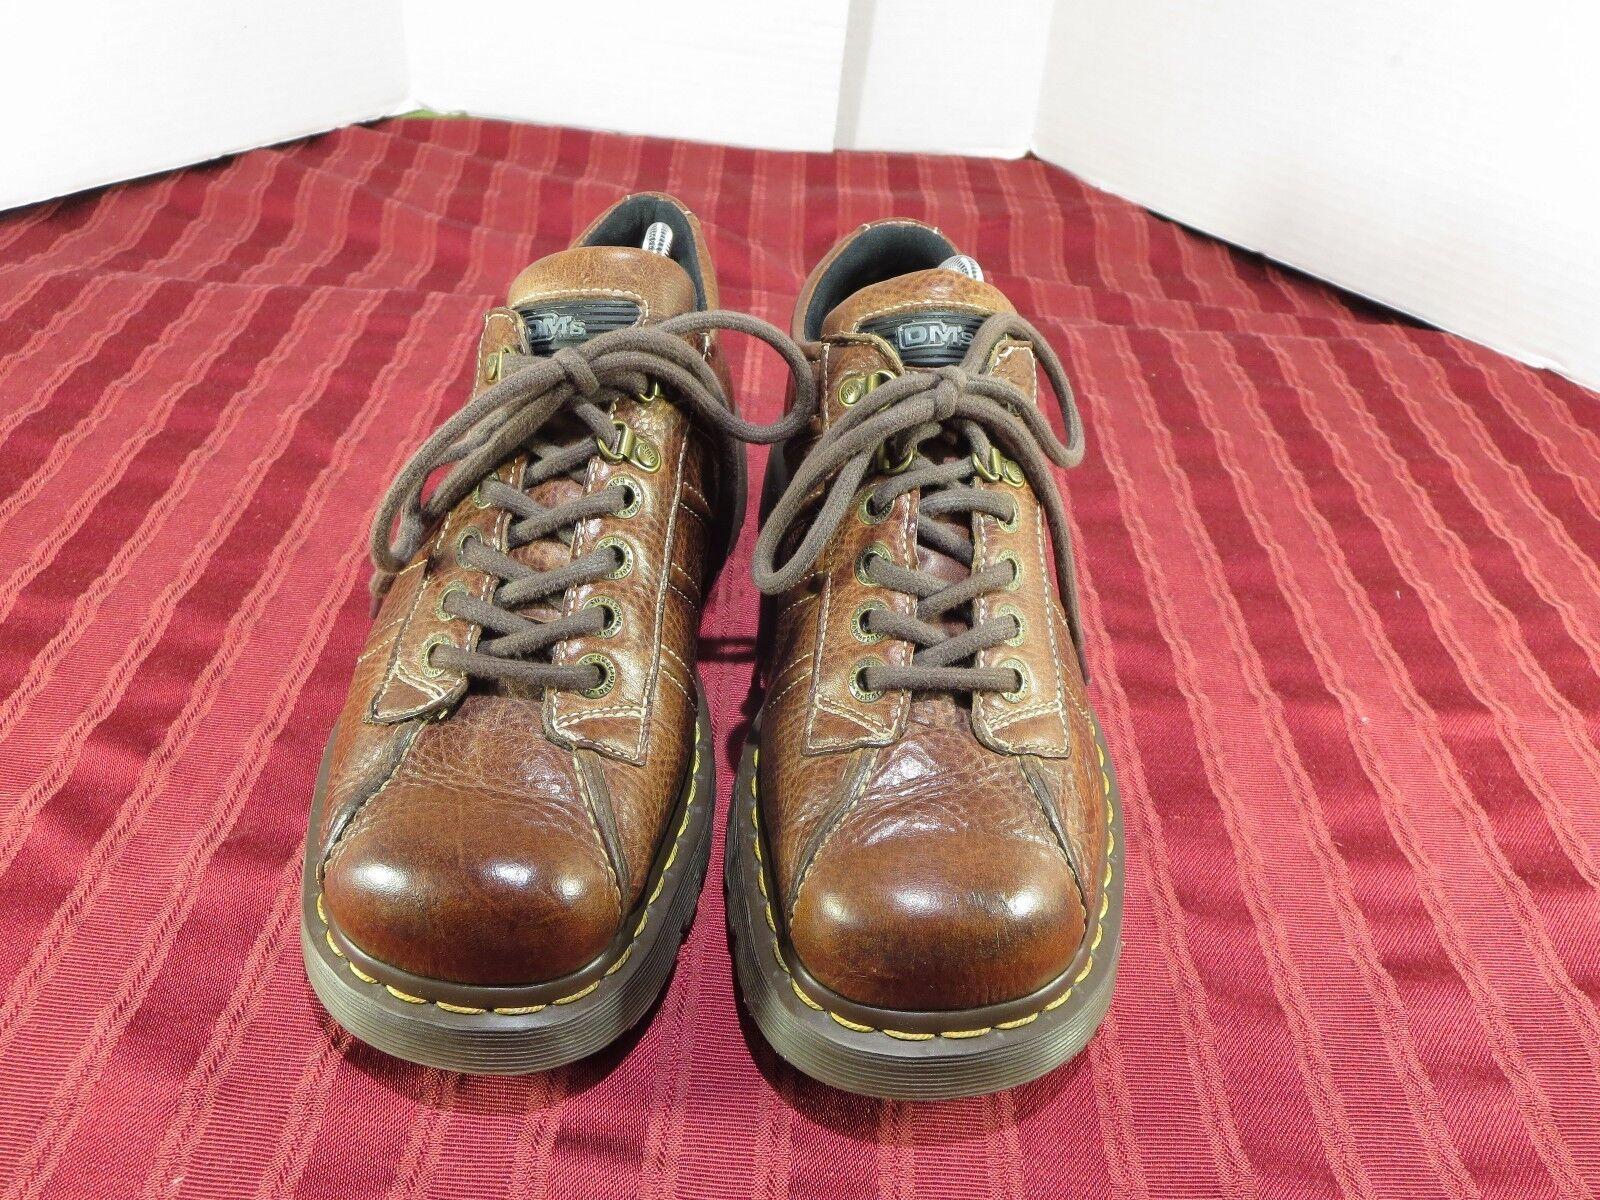 Dr Martens DM's 9764 Brown Leather Comfort Casual shoes Men Size 10 43 EUR